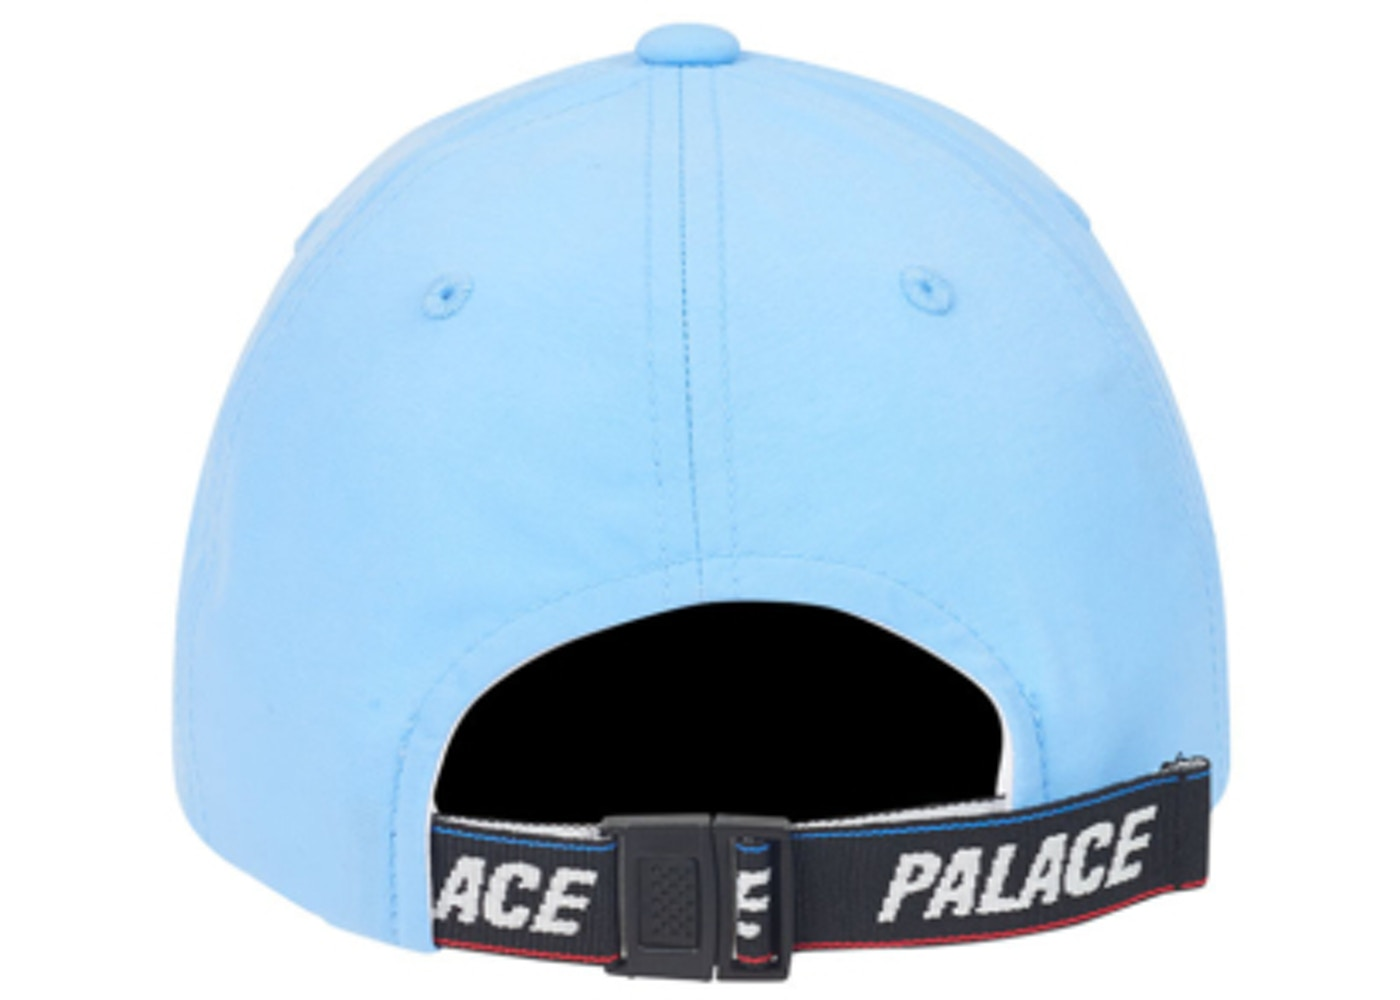 da015002a Palace Basically A Sports Shell 6-Panel Blue - SS19